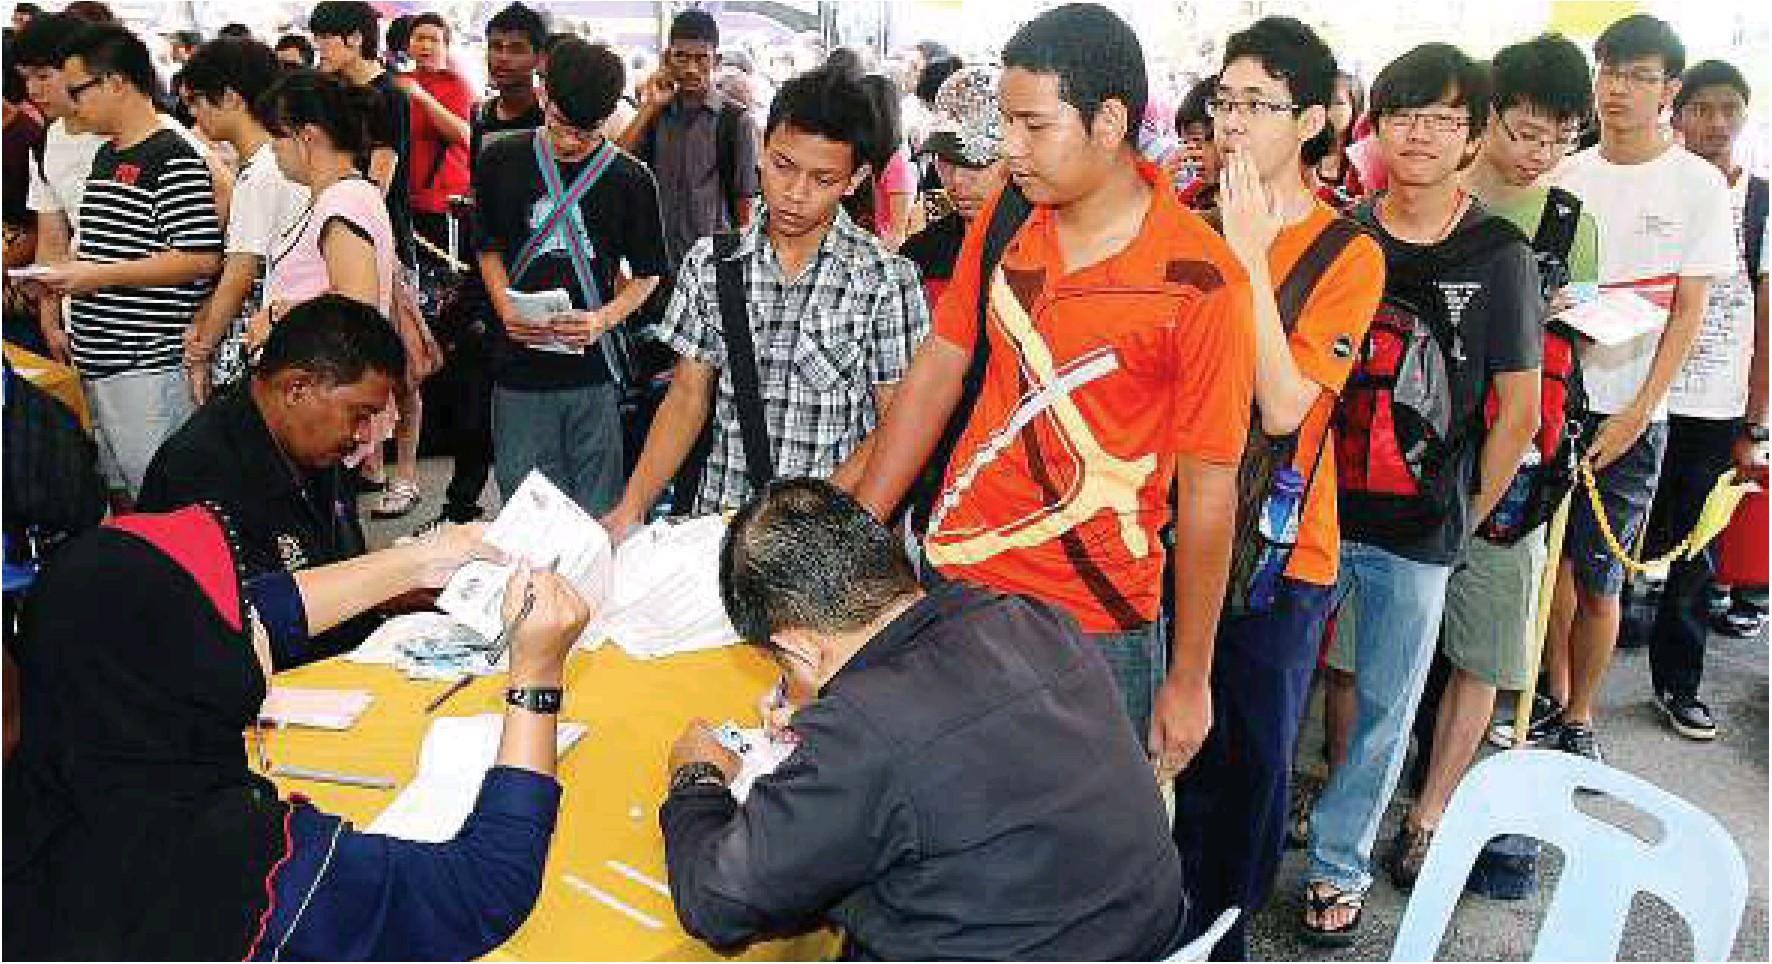 National Service Training Programme (Malaysia)